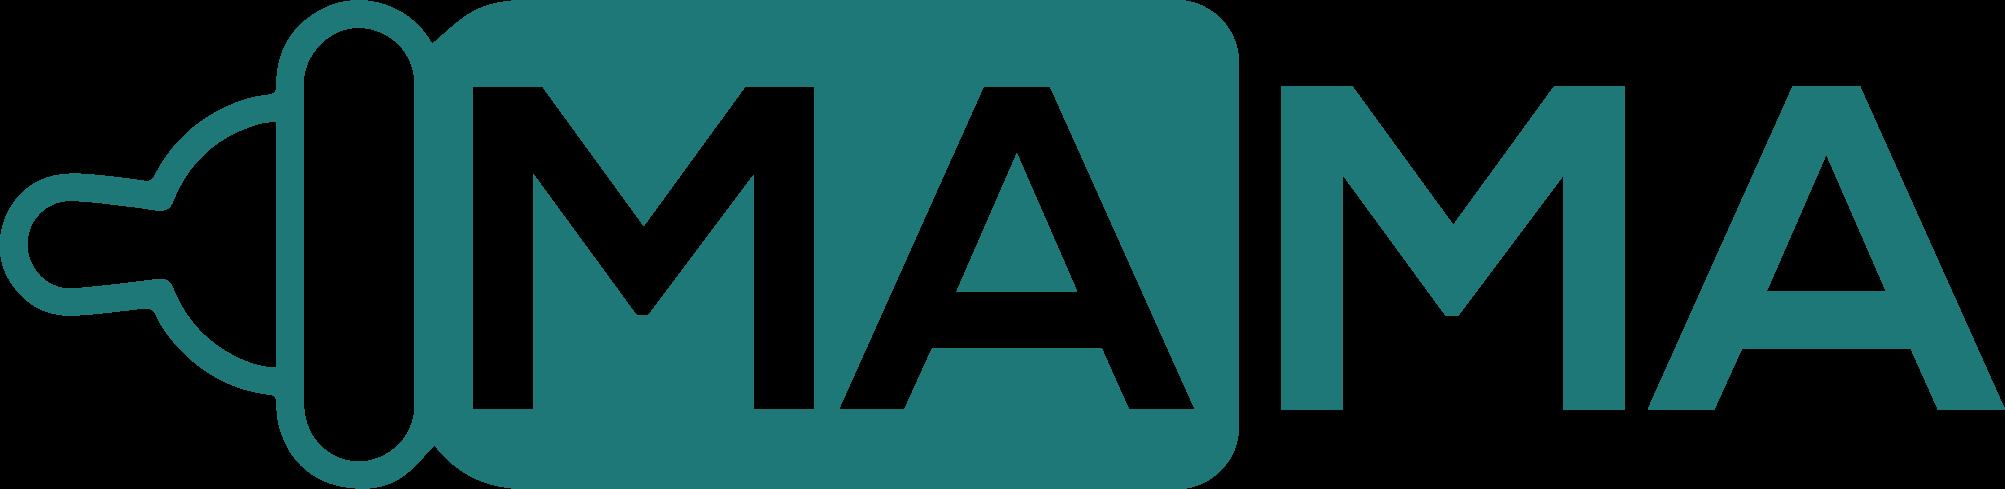 cropped-Logo-MaMa-zonder-ondertitel.png